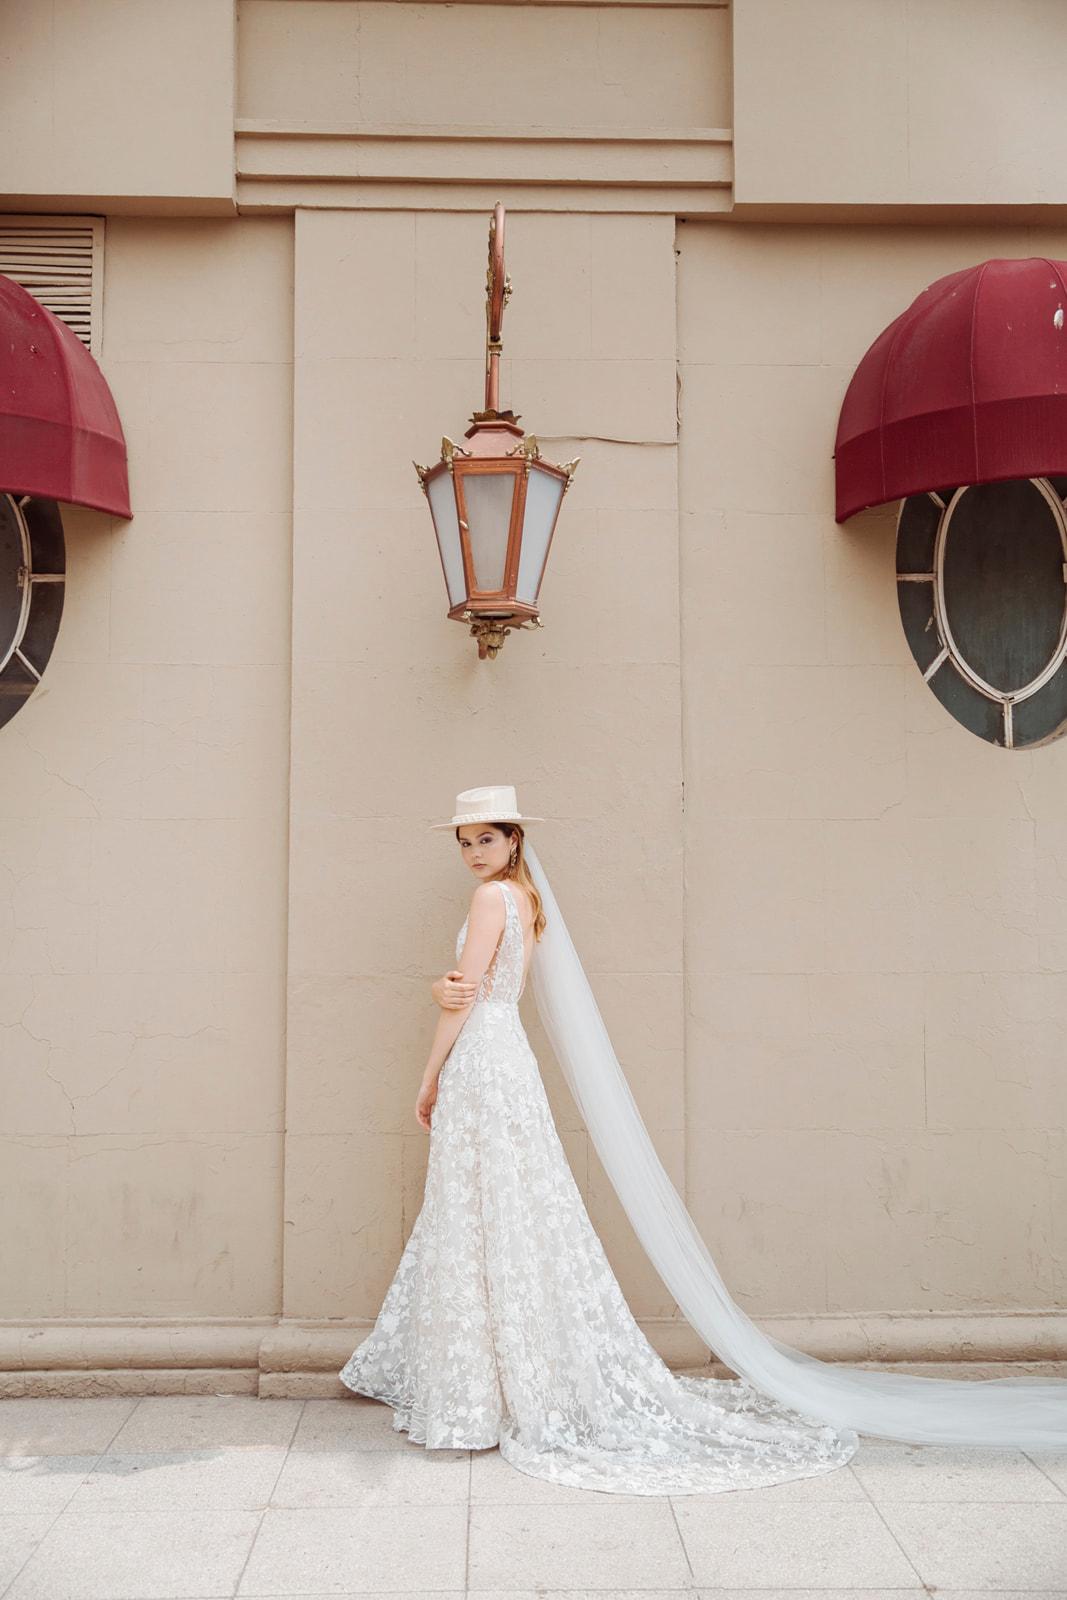 Carlotta_dress_(44_of_58).jpg